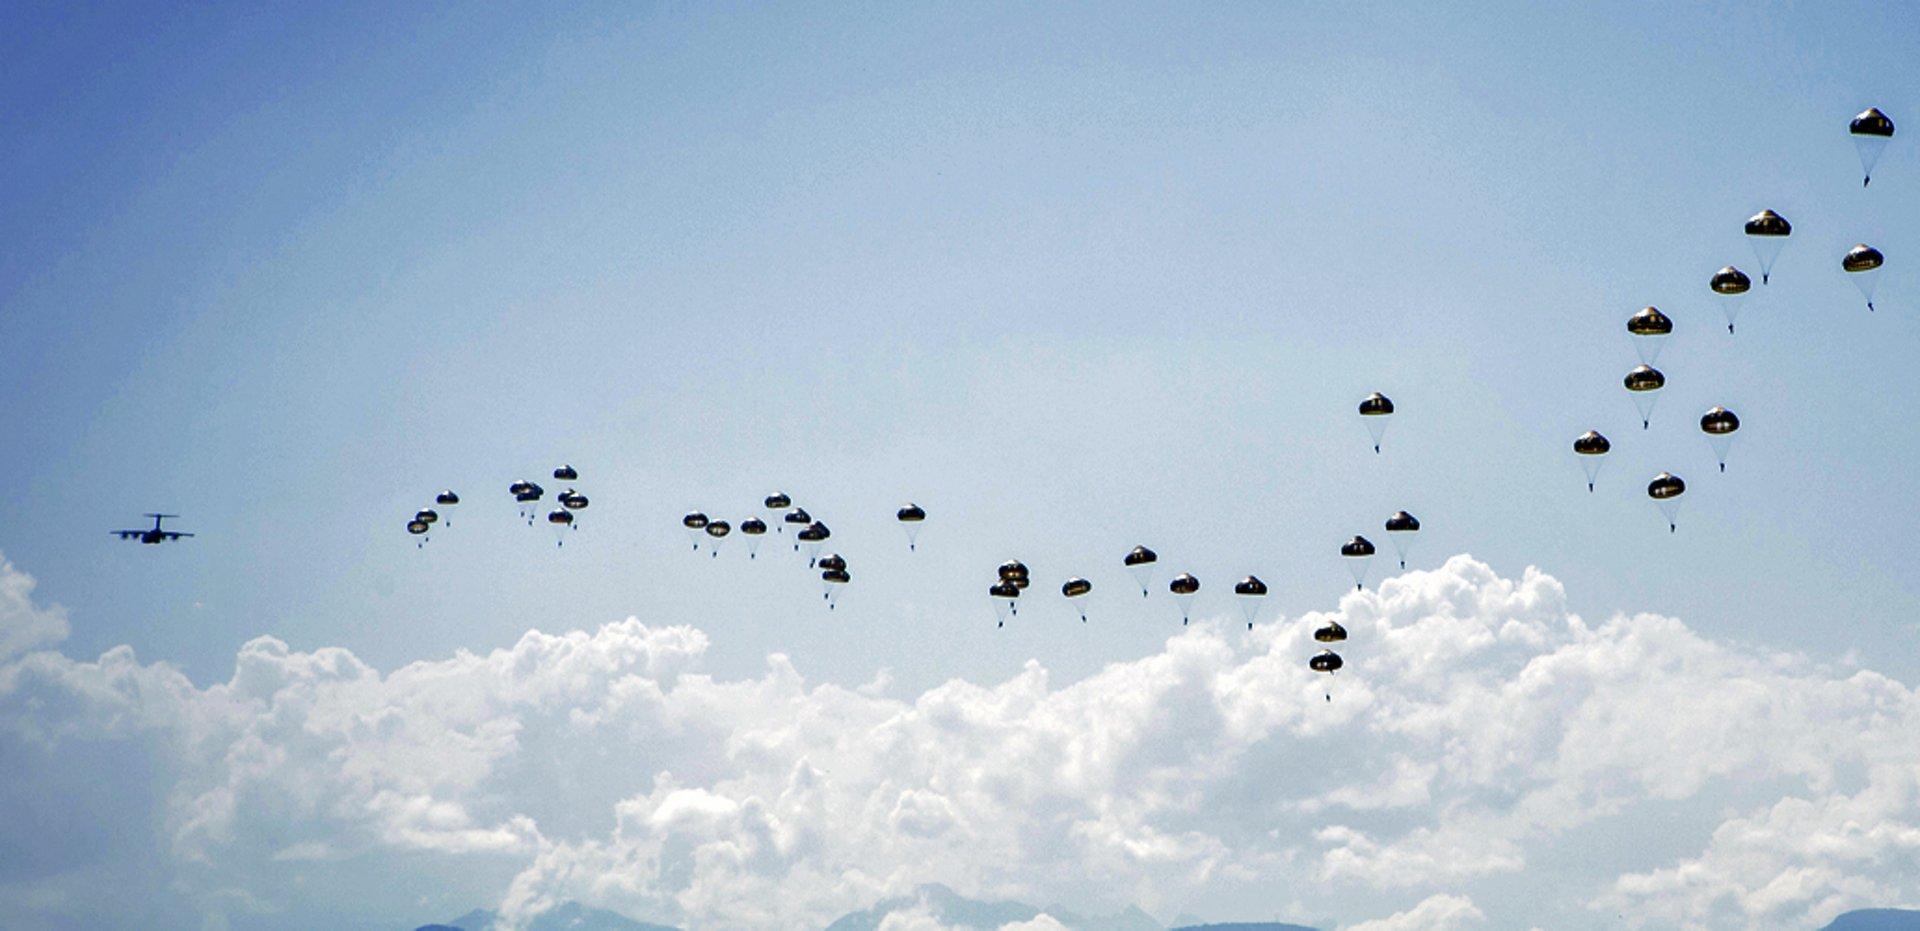 AG真人计划 A400M completes paratrooper simultaneous dispatch